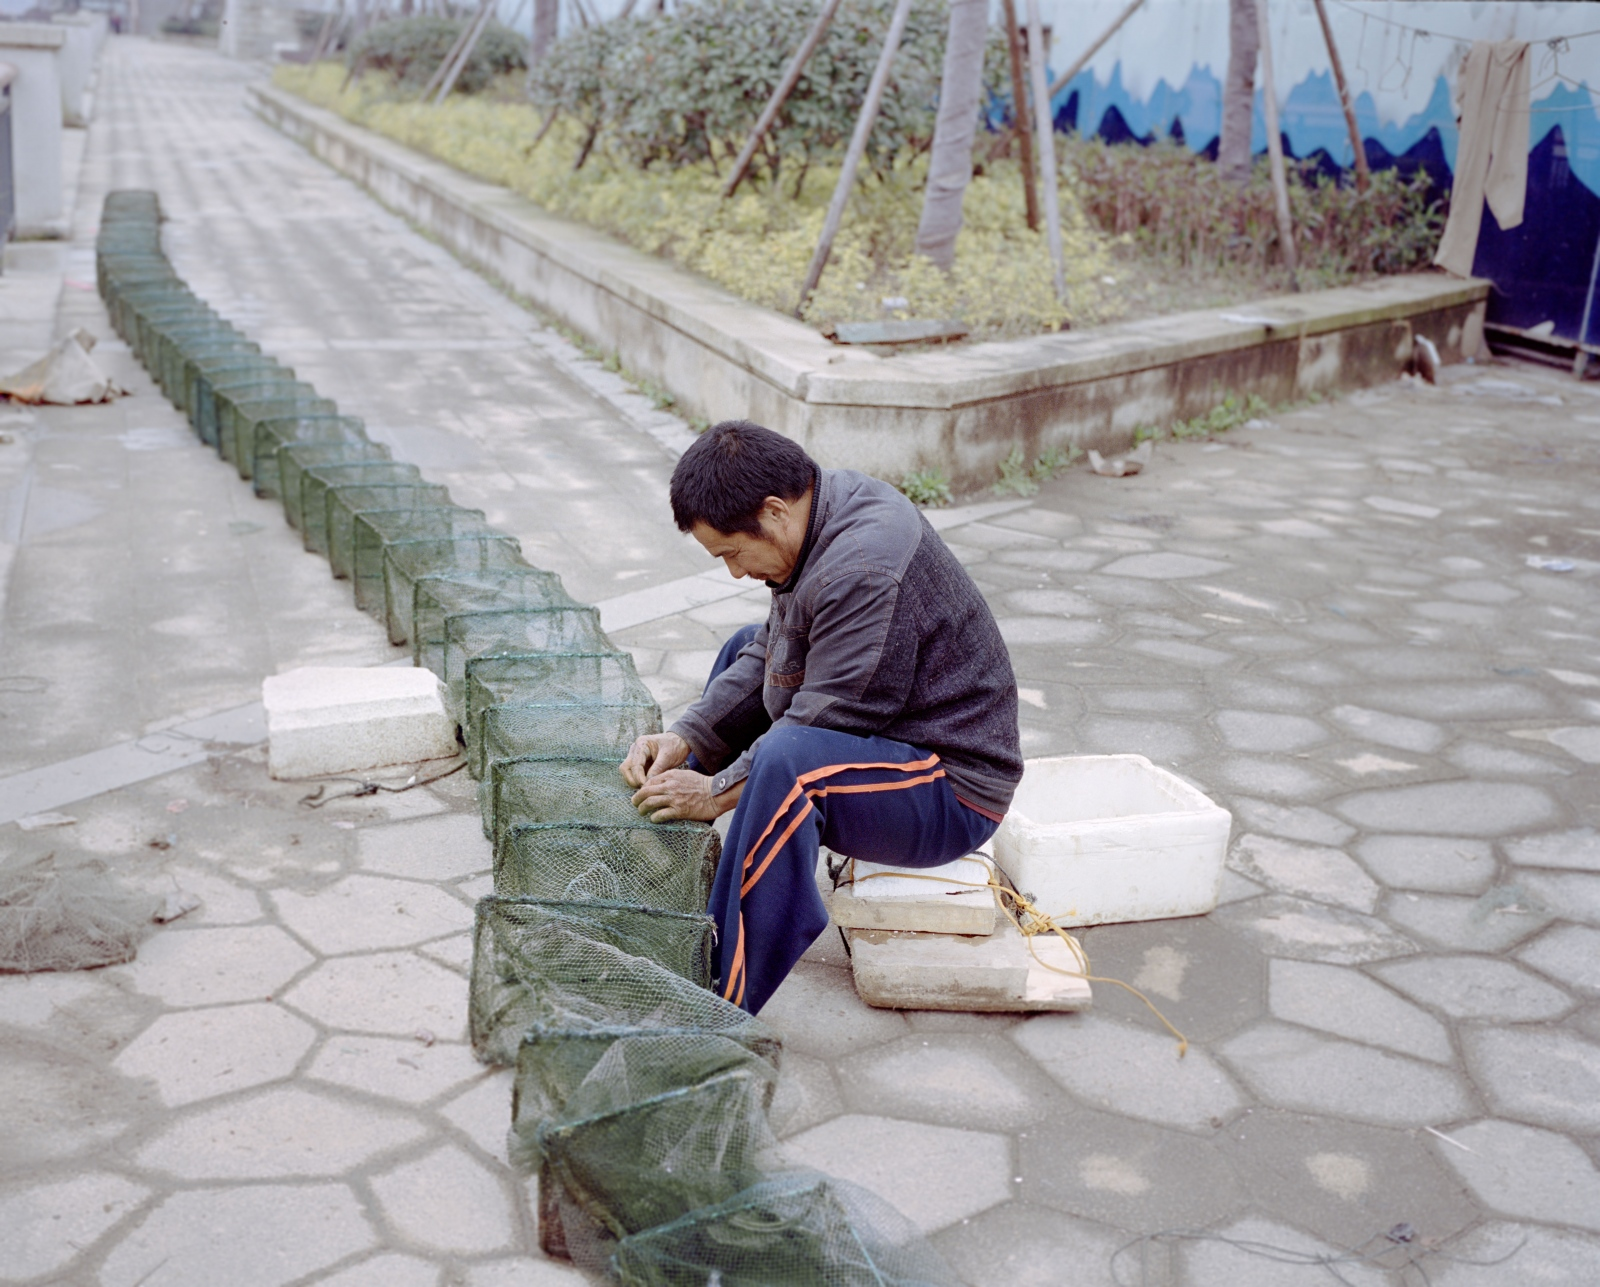 Min River Bank 闽江江畔